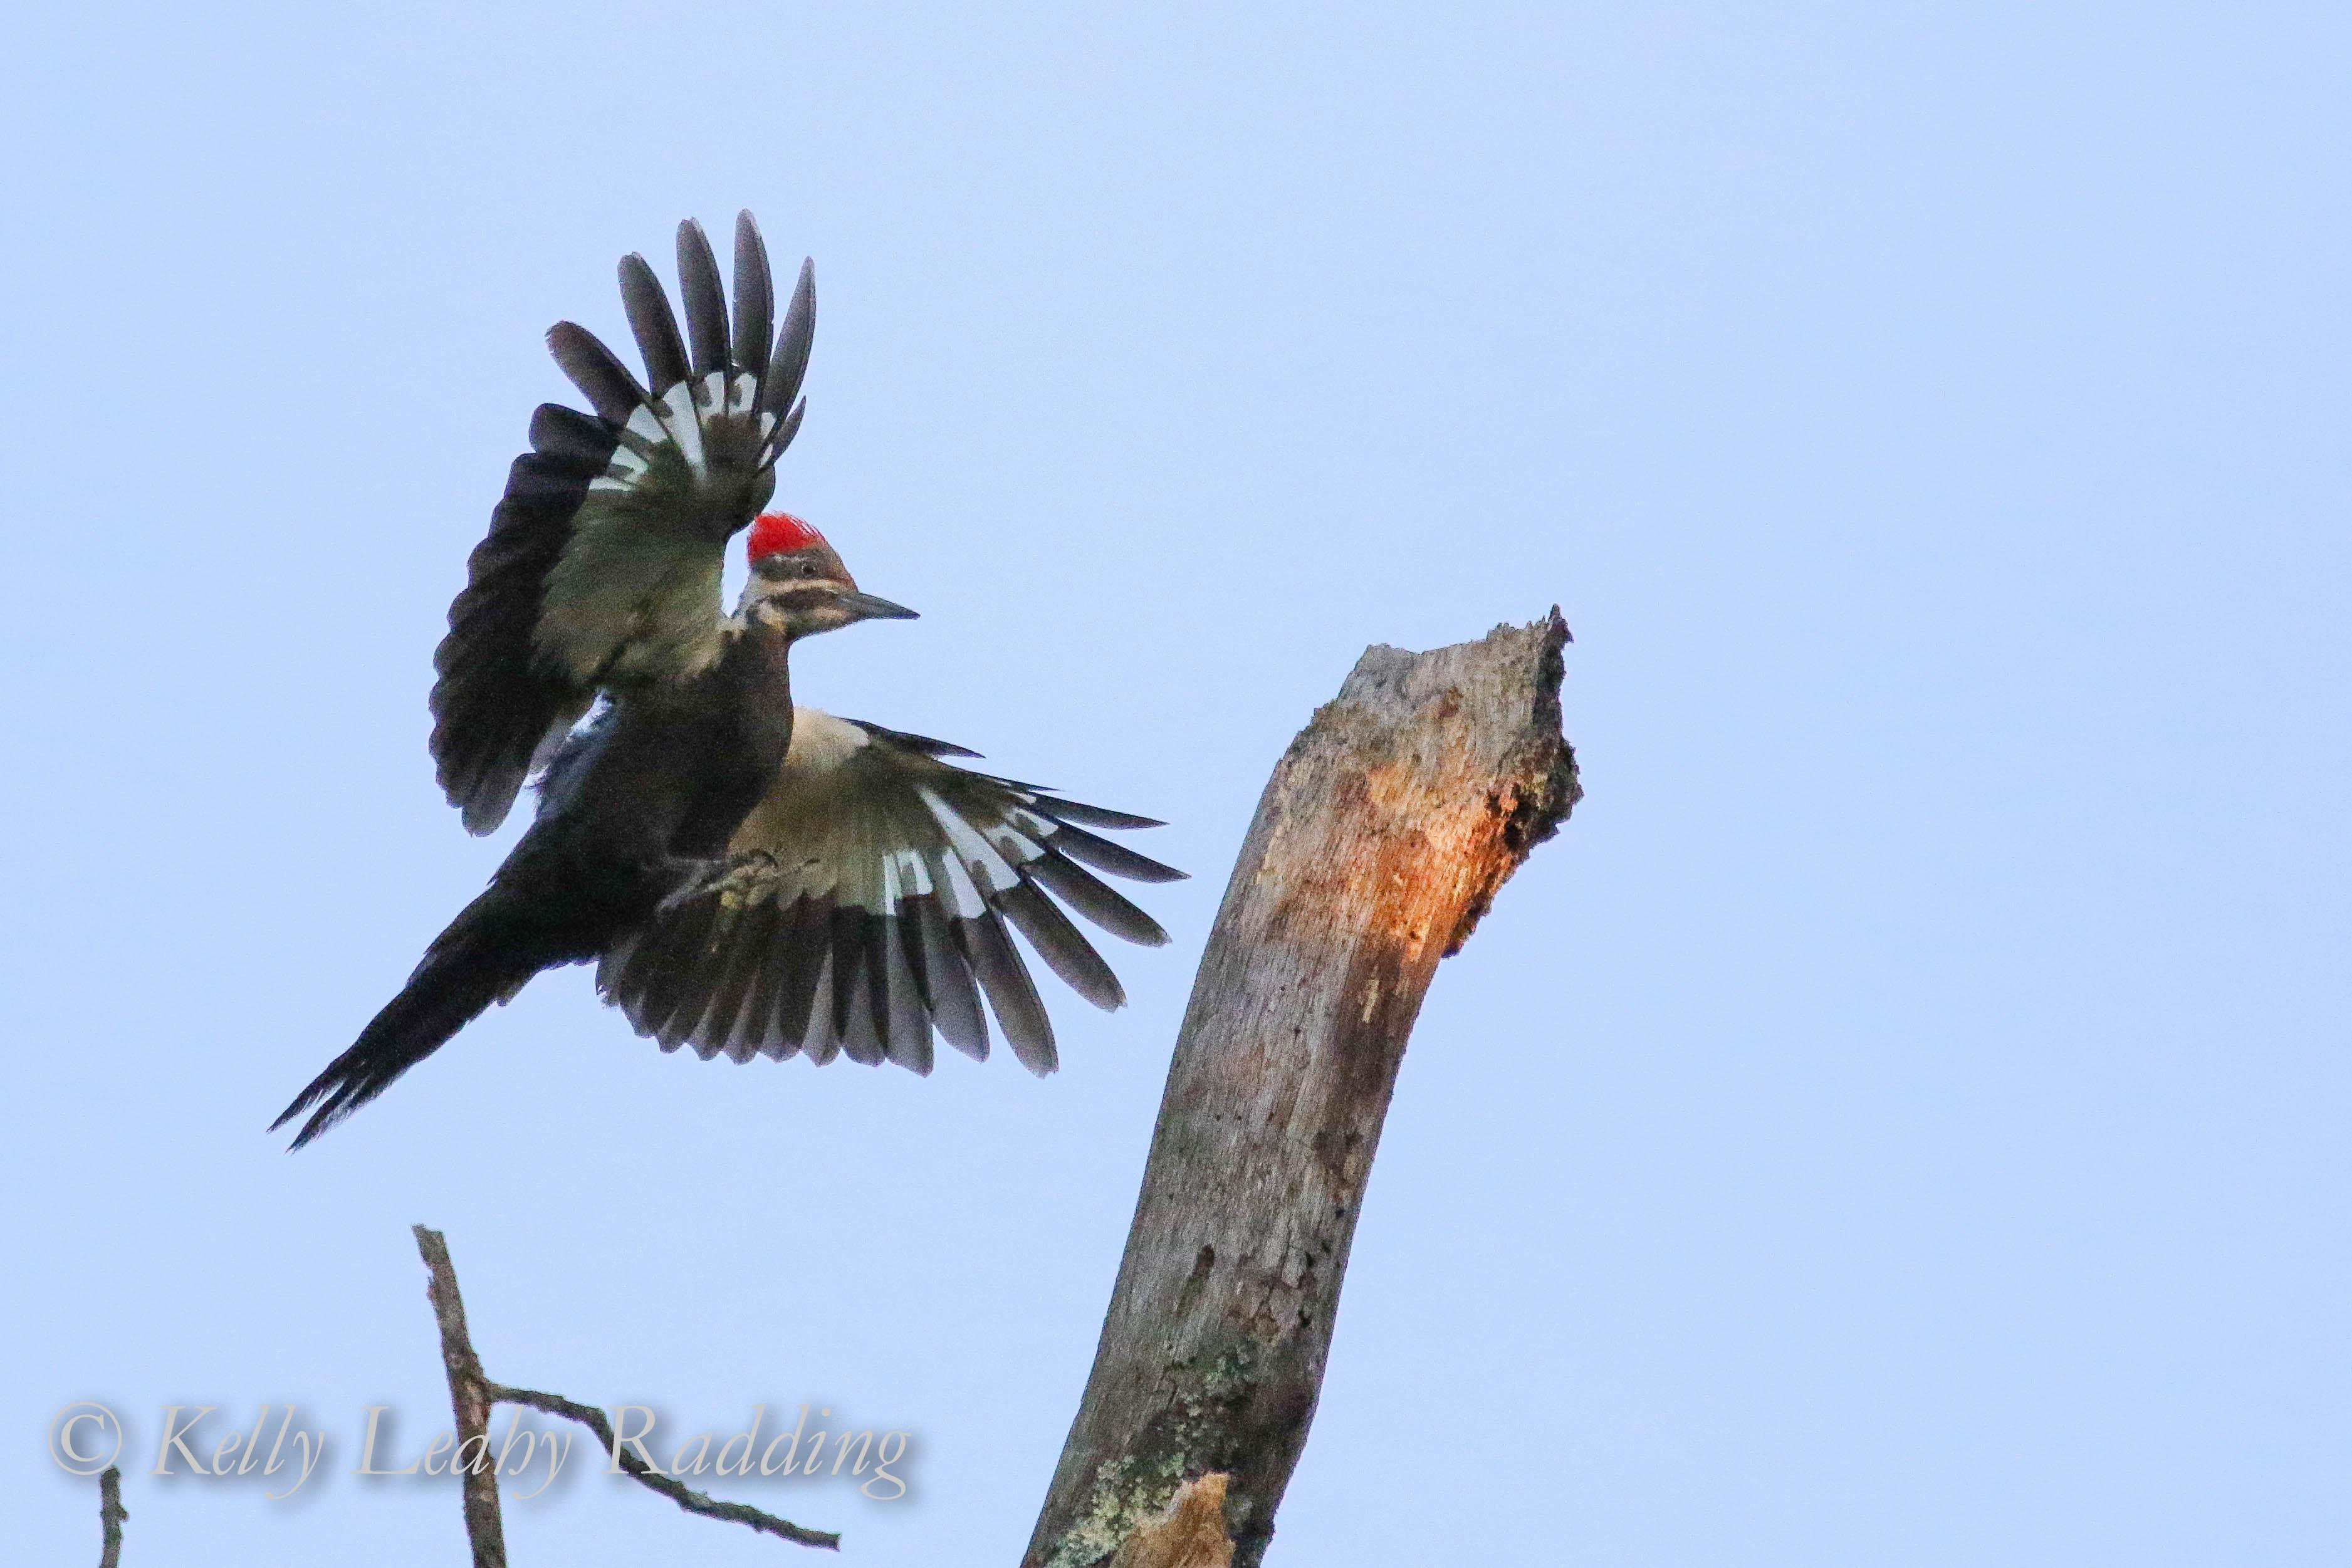 pileated woodpecker, Kelly Leahy Radding